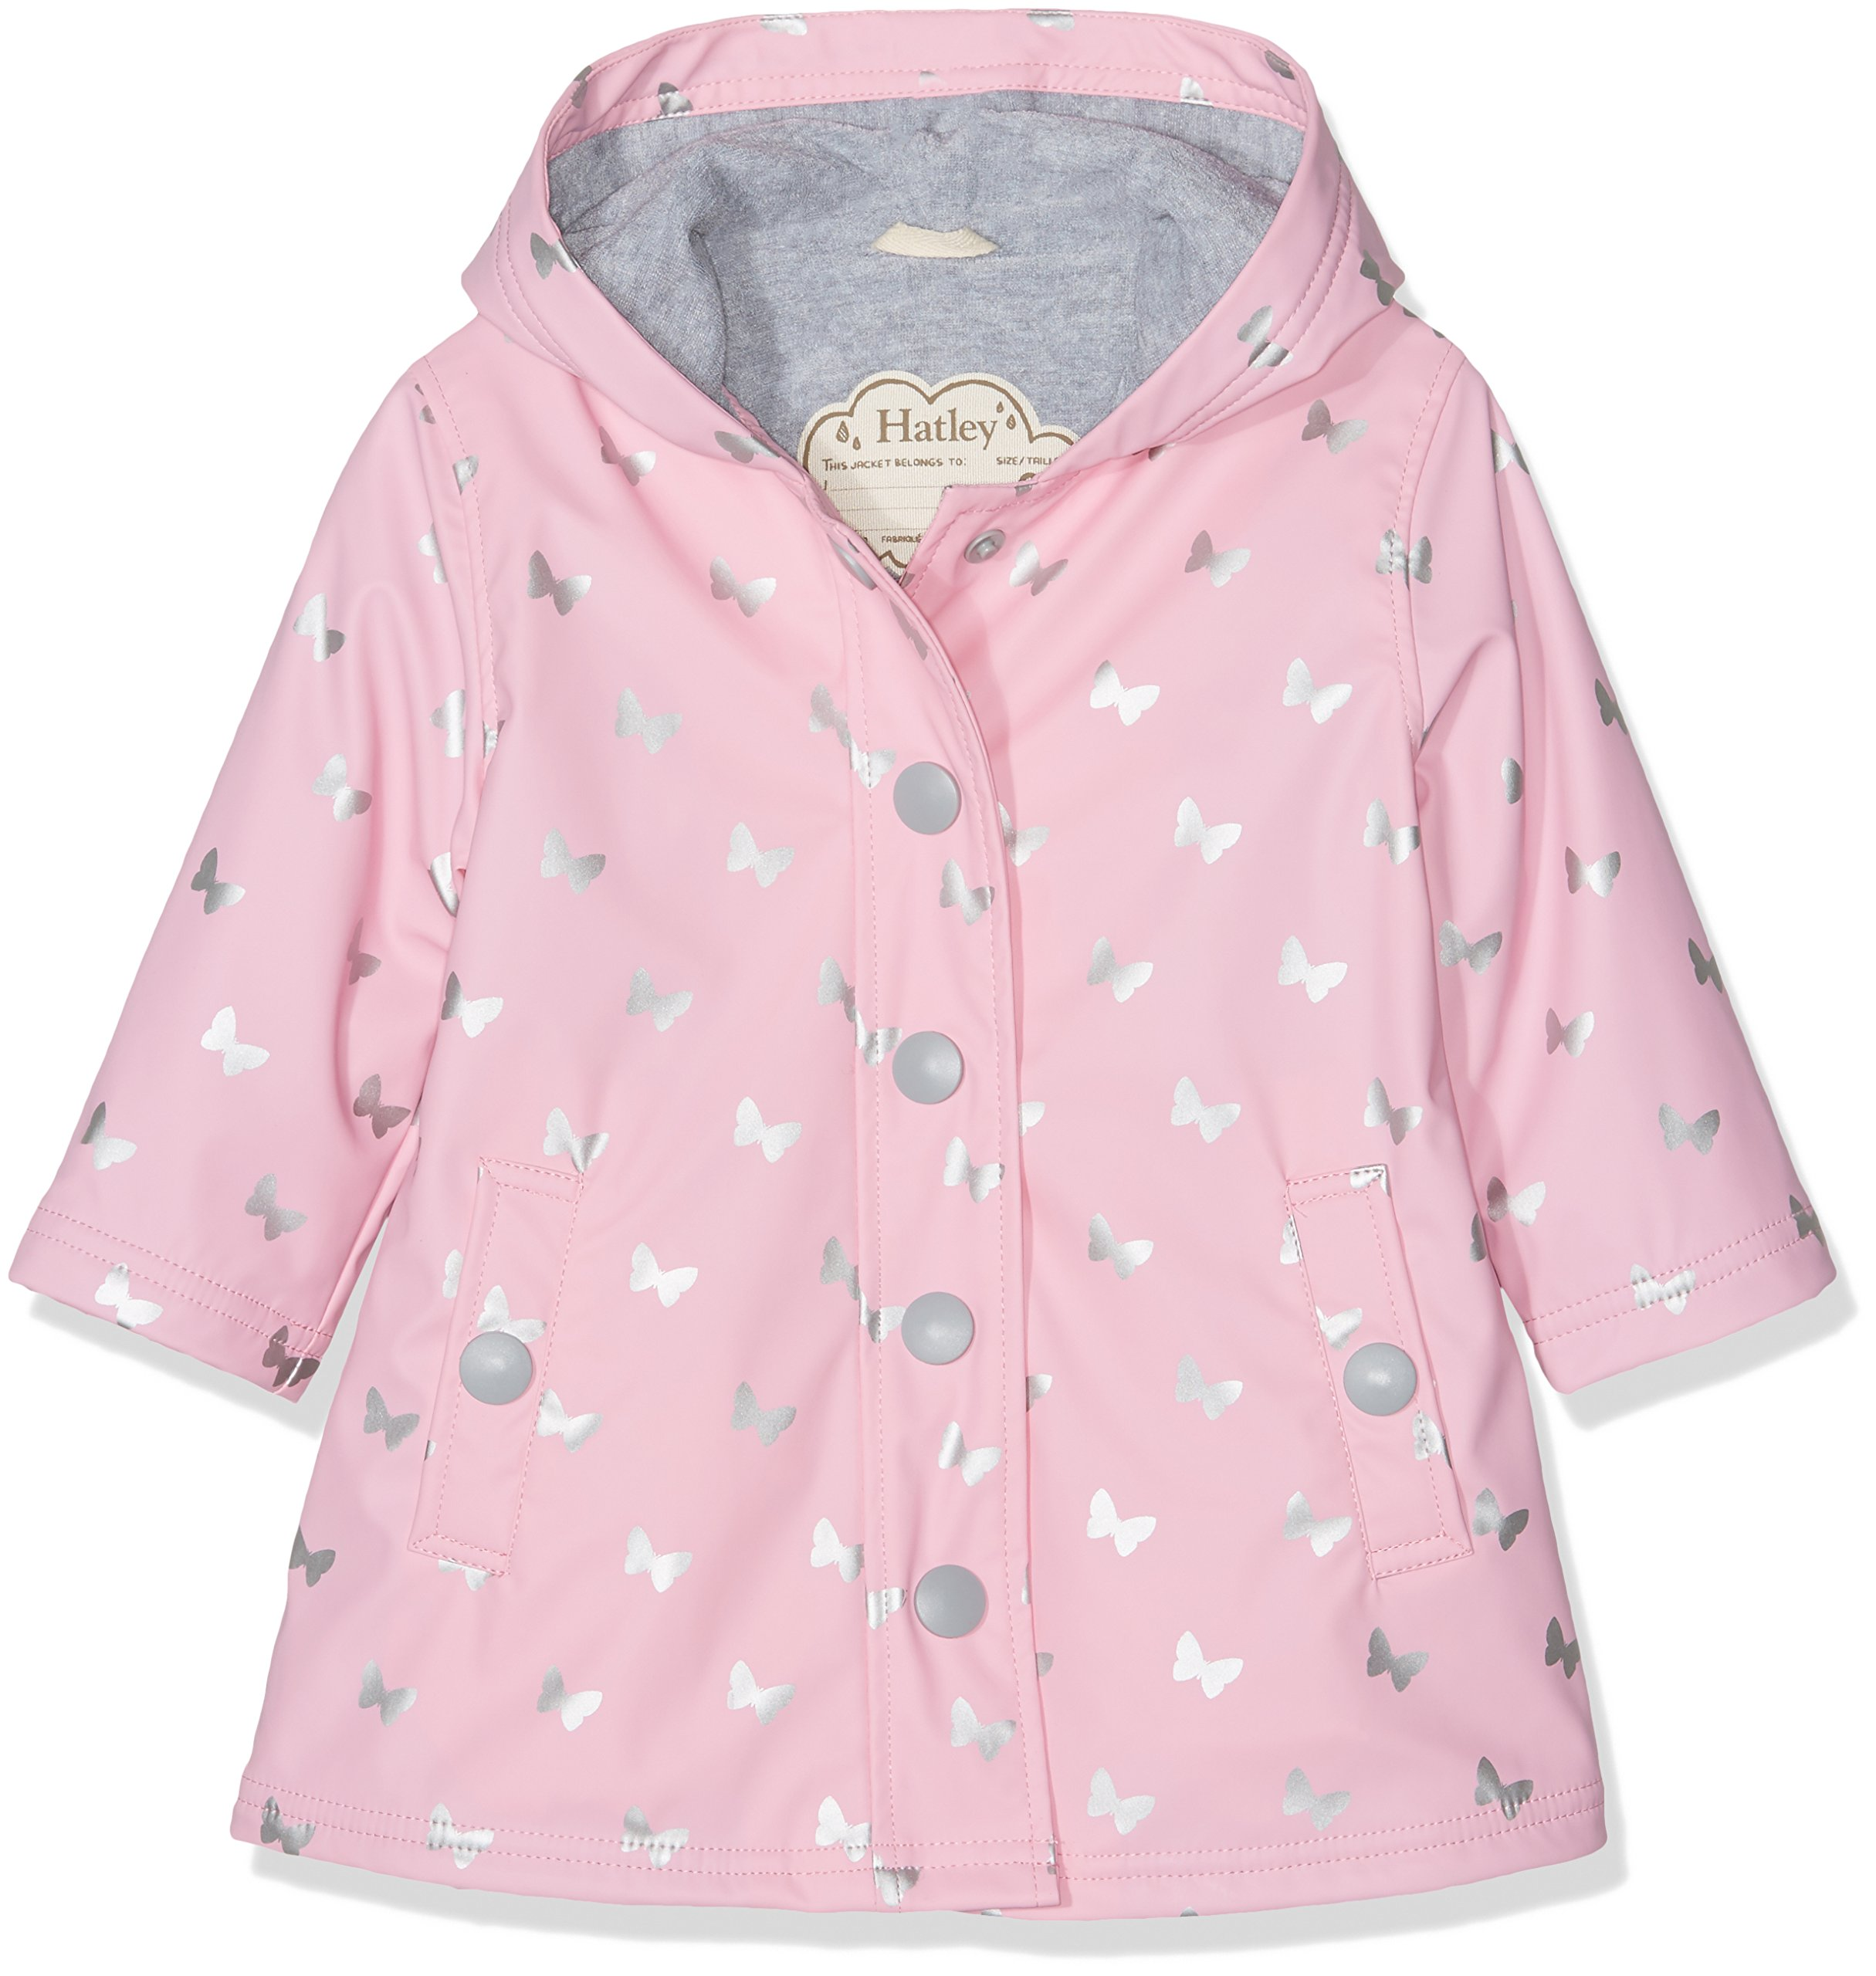 2692c49abafd Galleon - Hatley Little Girls  Splash Jackets